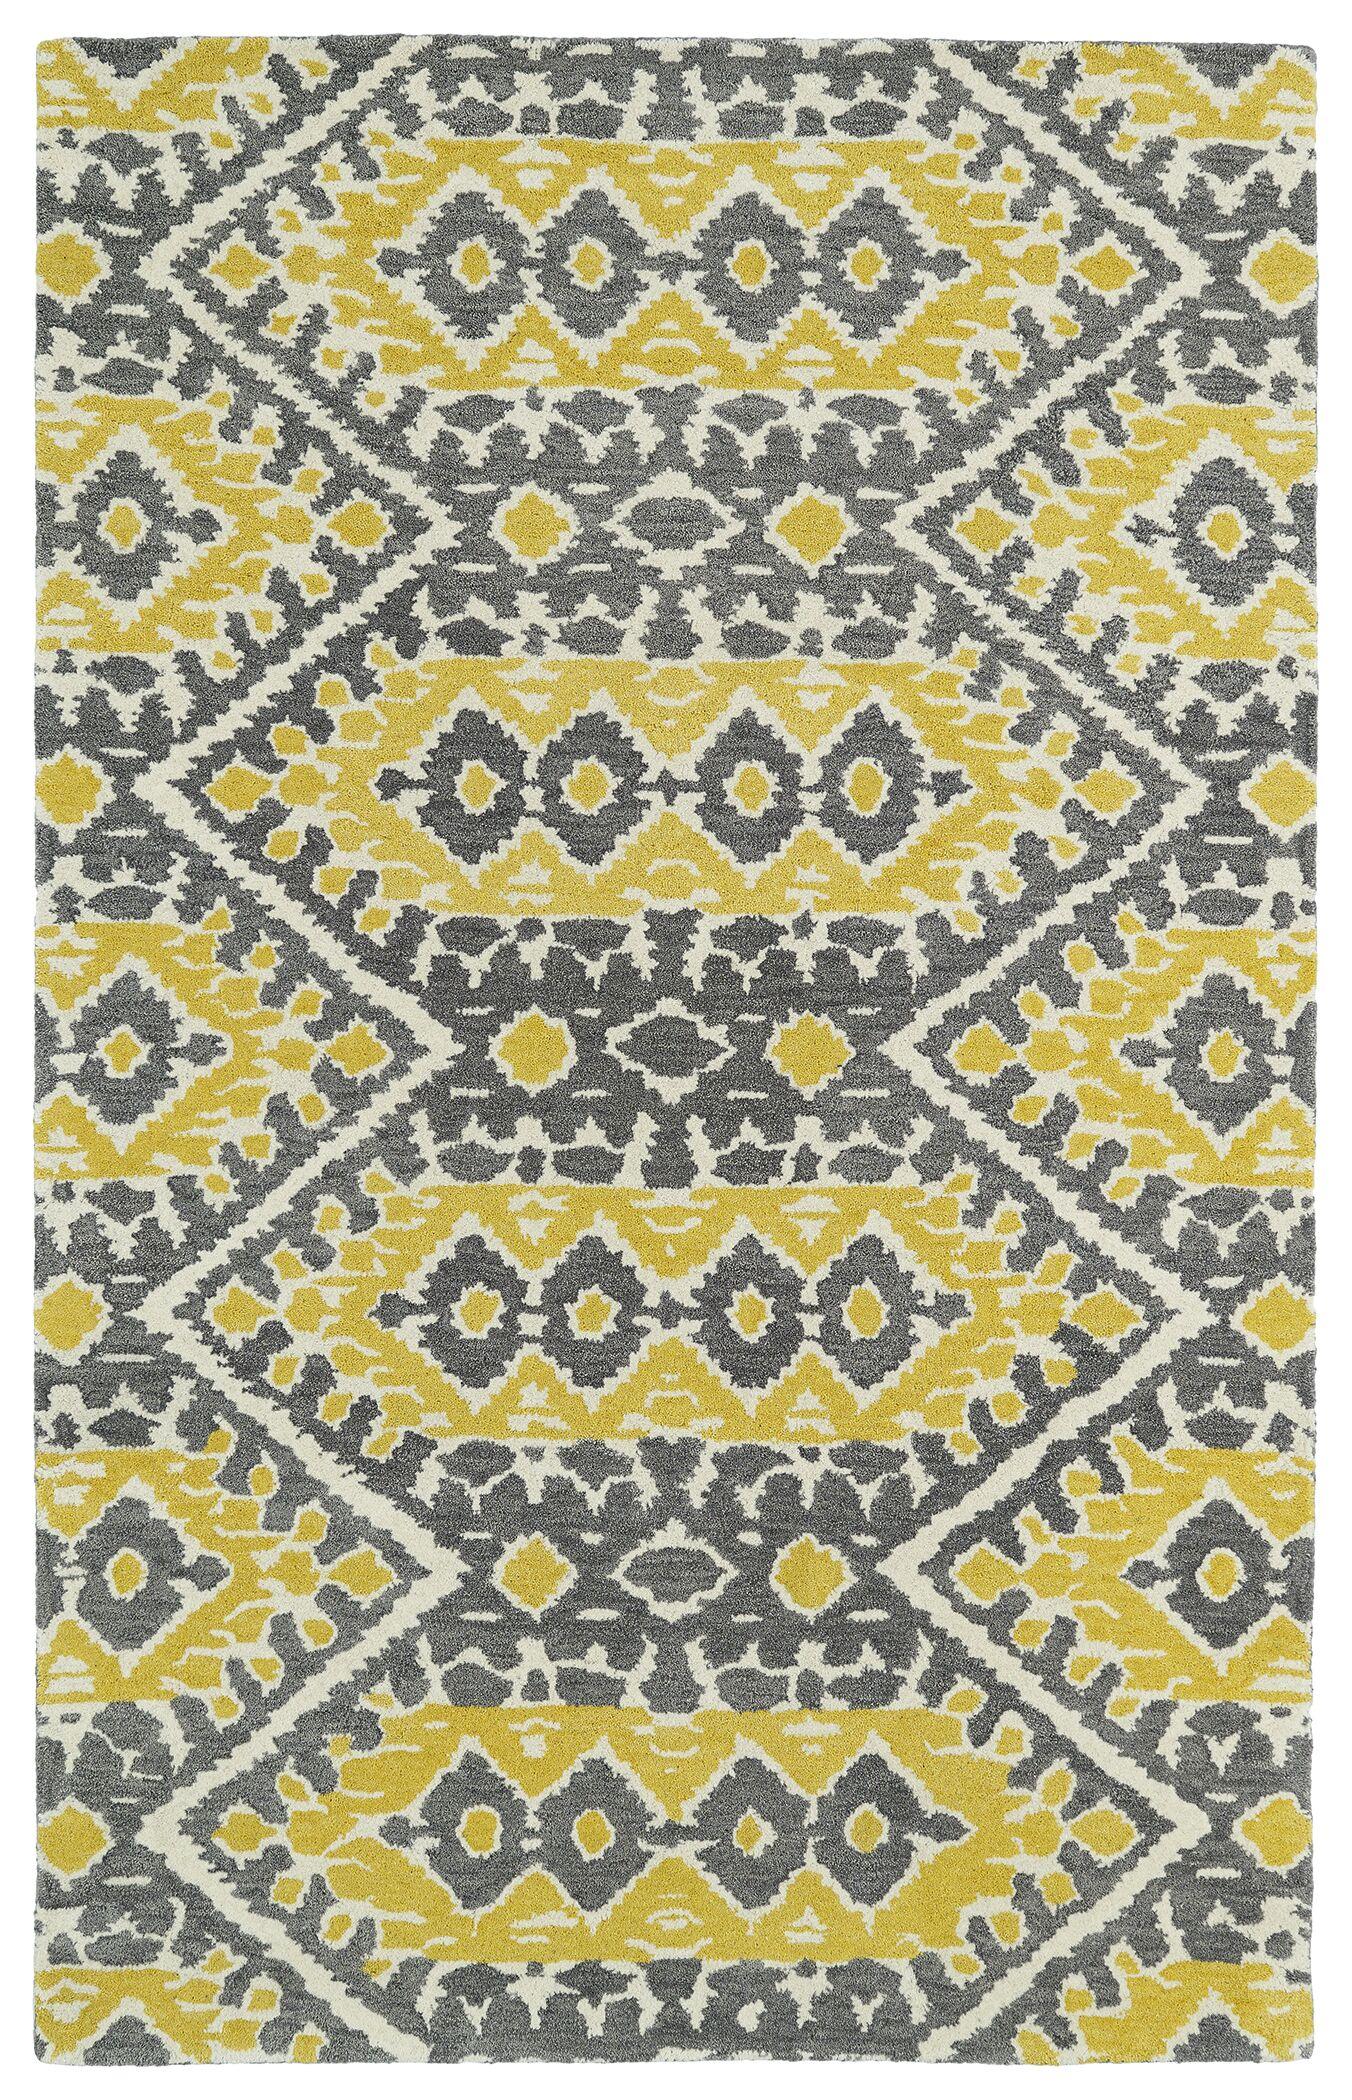 Kasa Yellow Area Rug Rug Size: Rectangle 9' x 12'